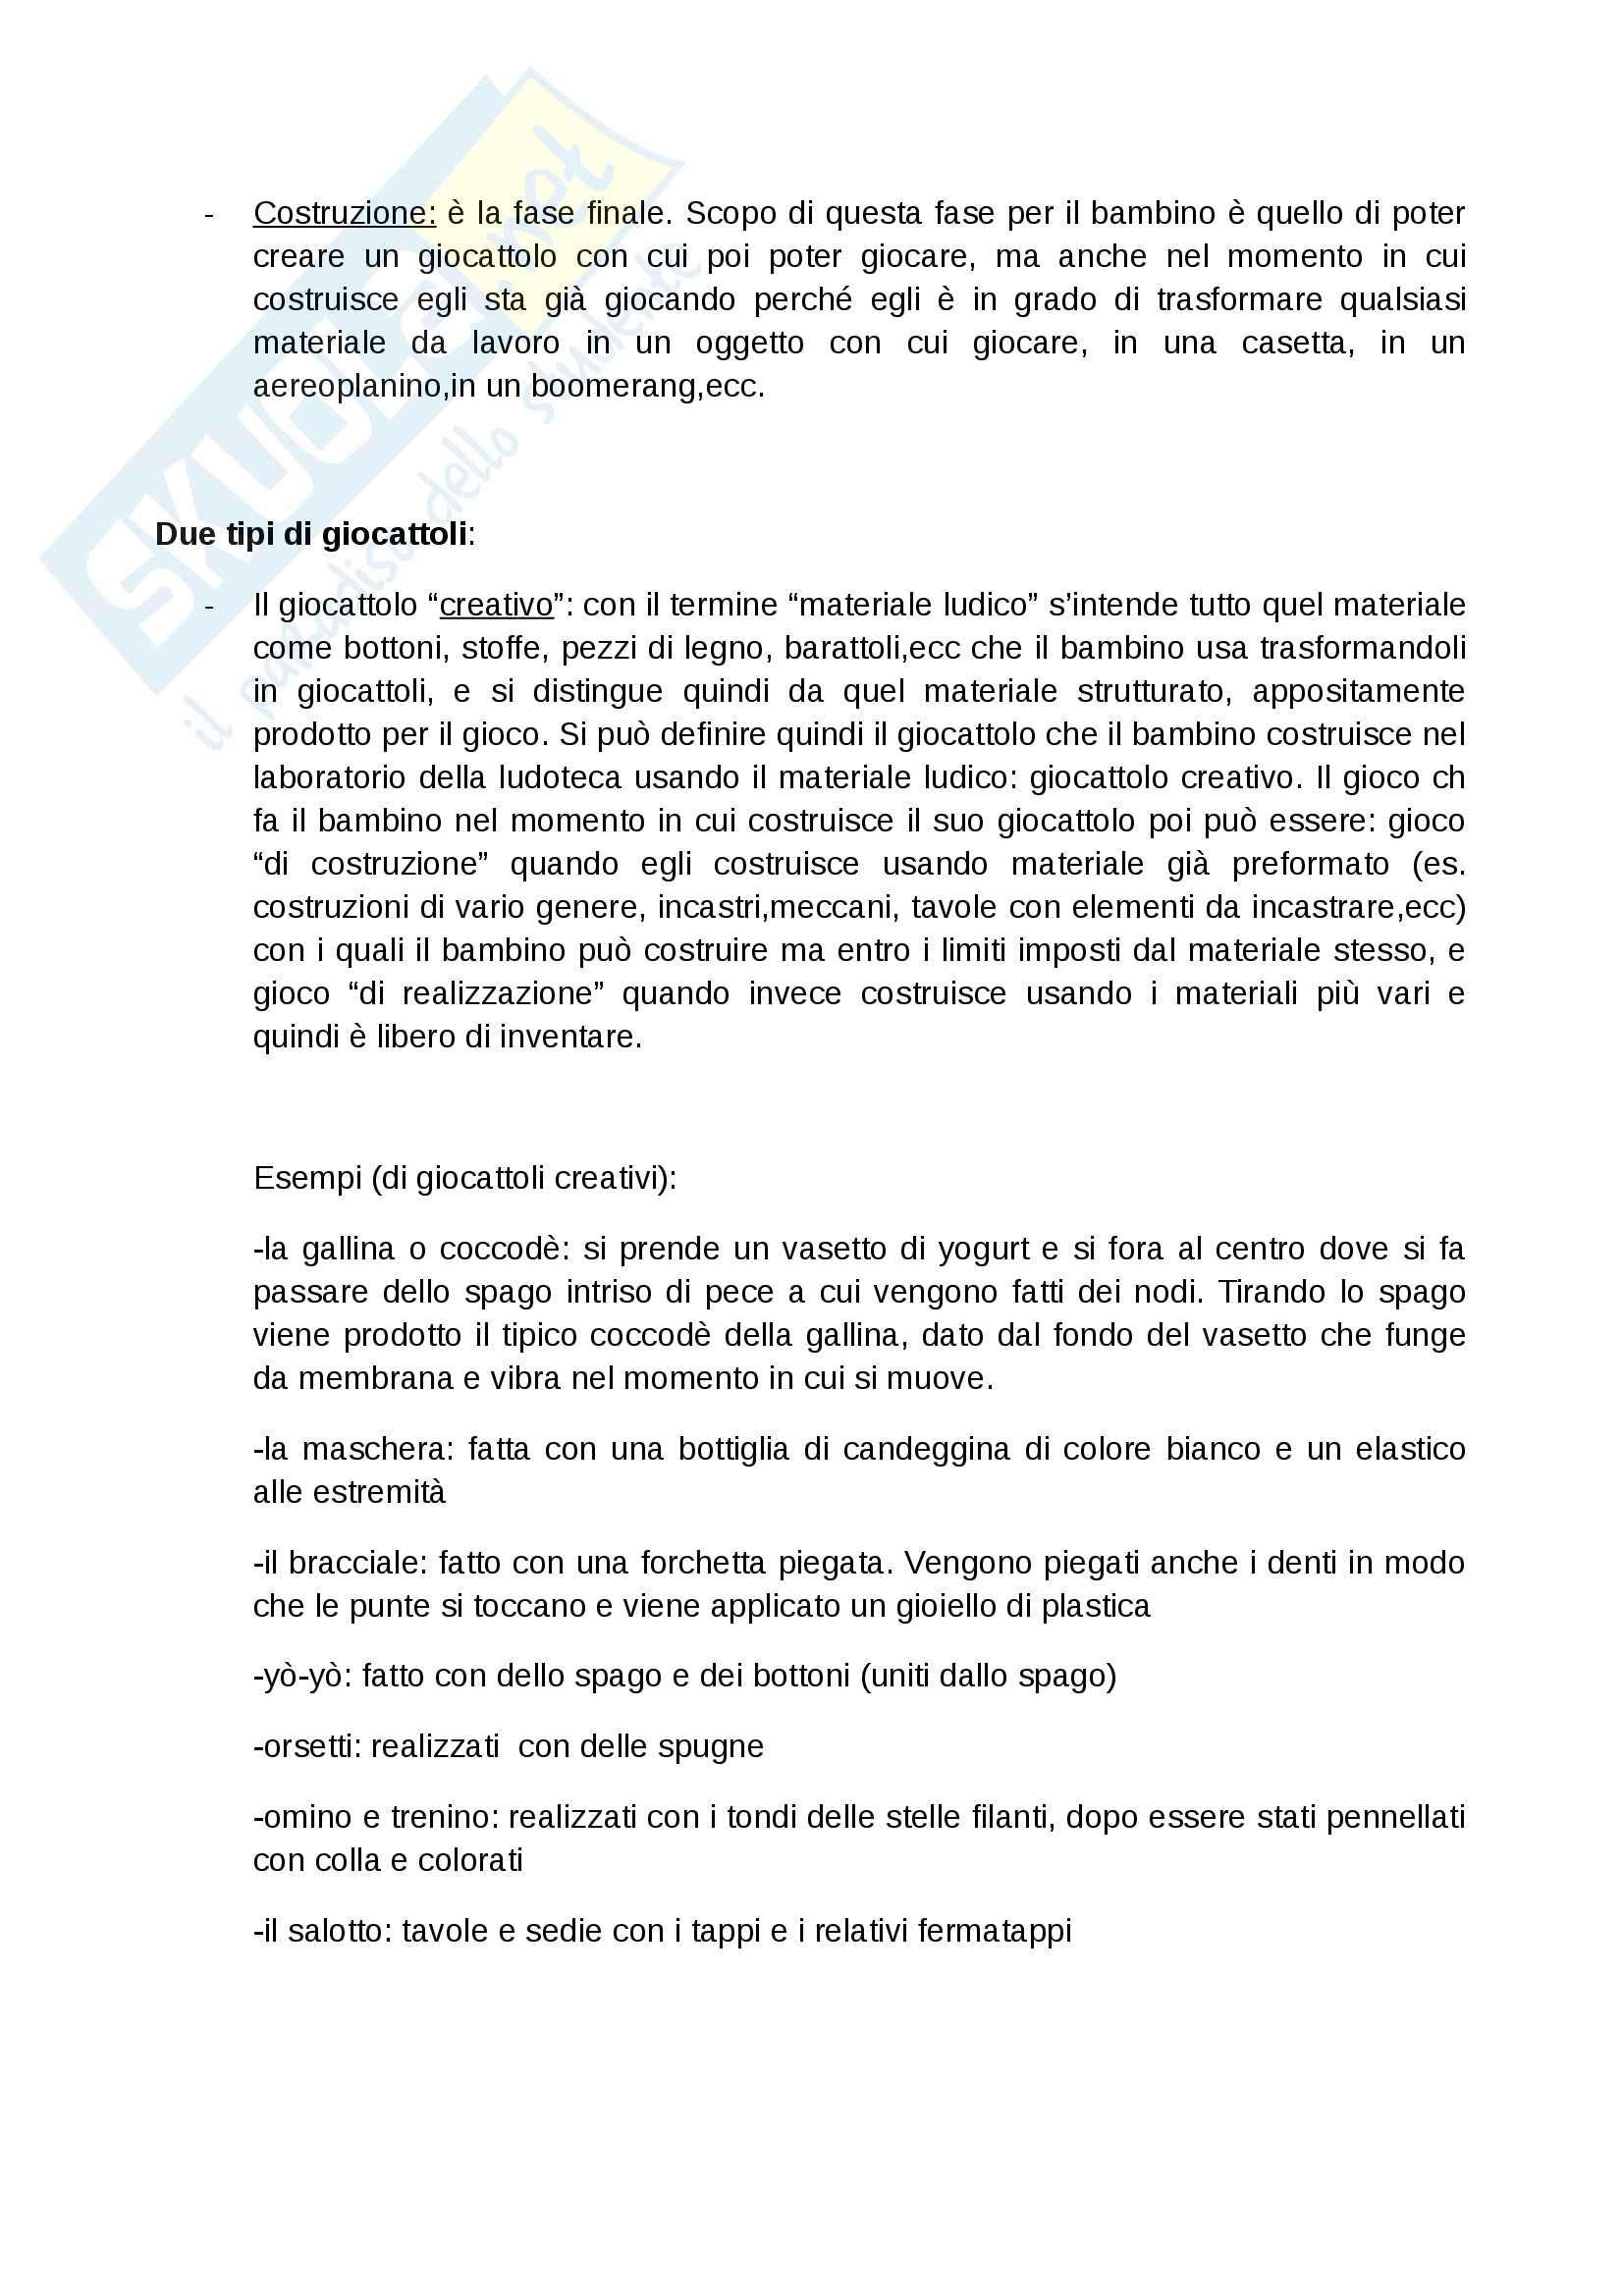 Riassunto esame Ludoteconomia, prof. De Angelis, libro consigliato Ludoteca e creatività, De Angelis Pag. 26